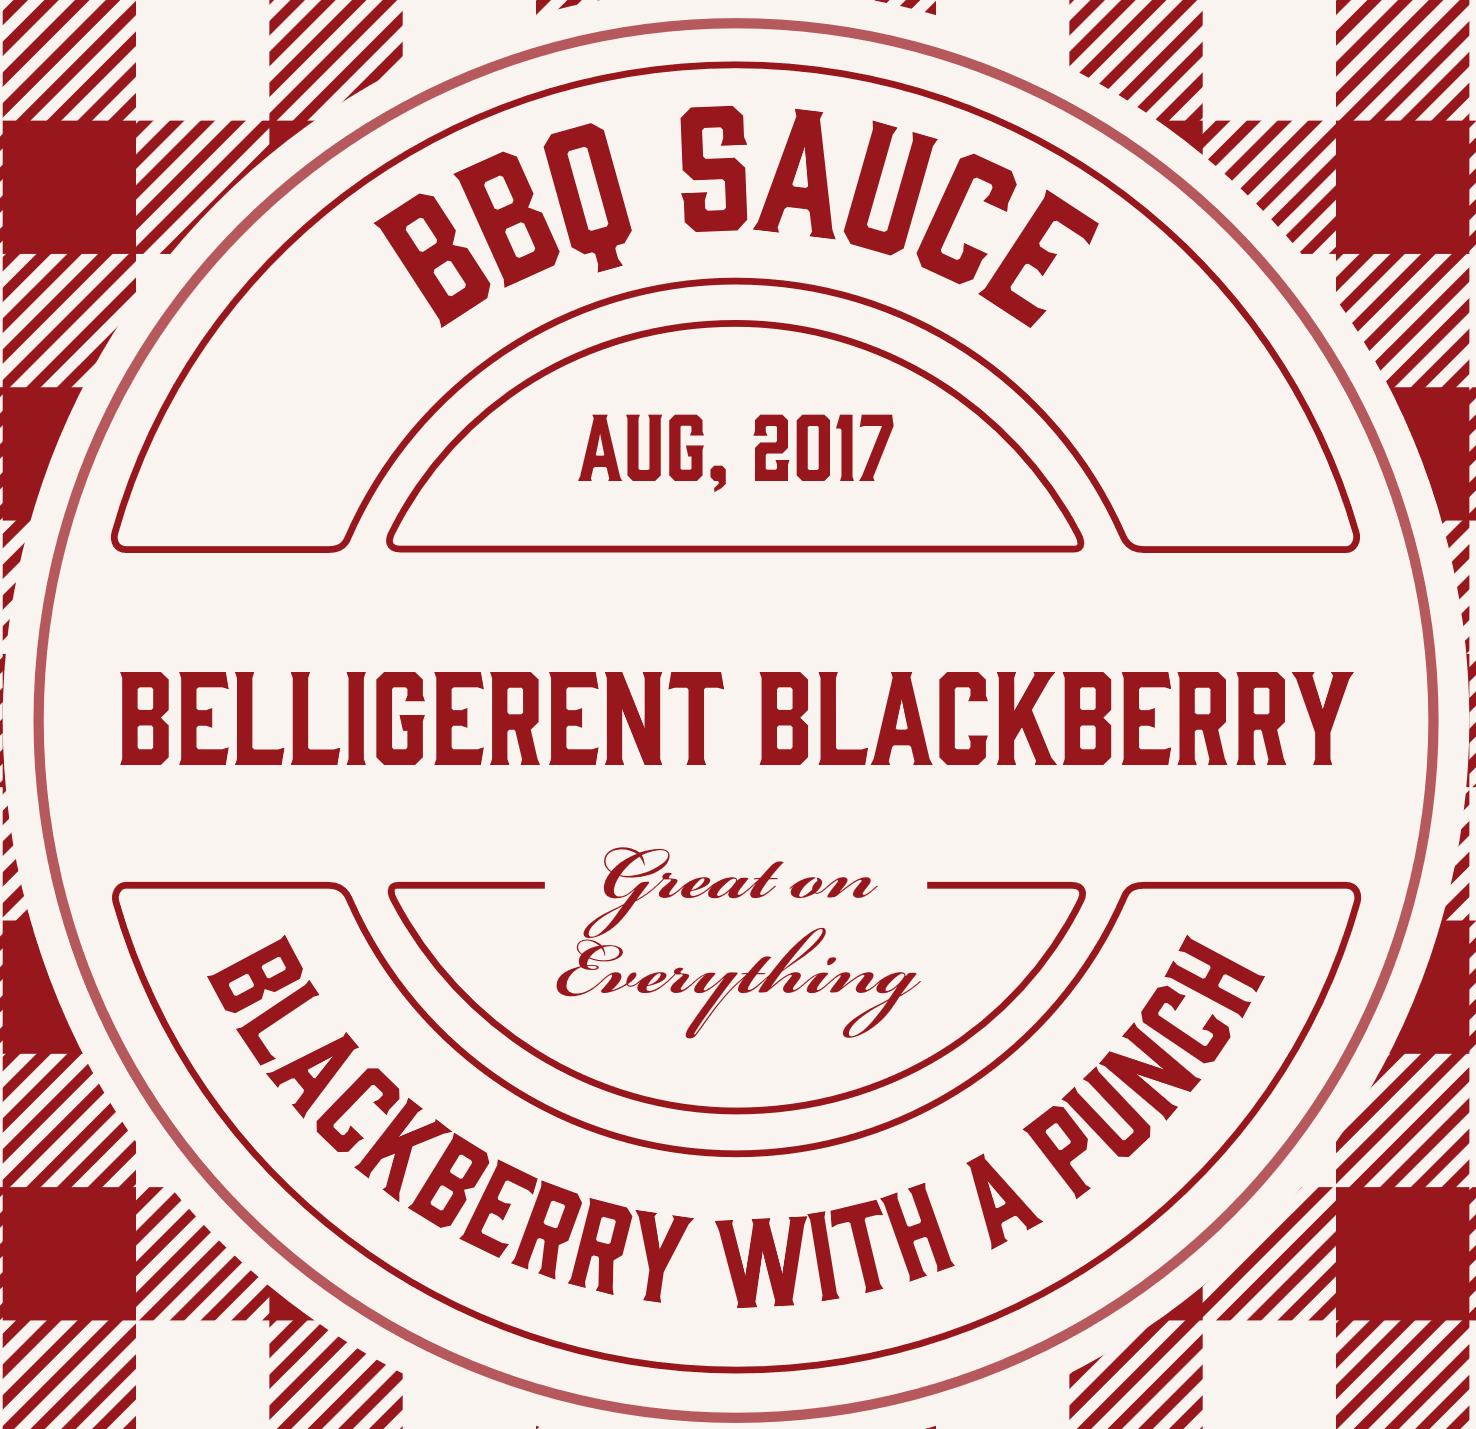 Belligerent Blackberry BBQ Sauce BB